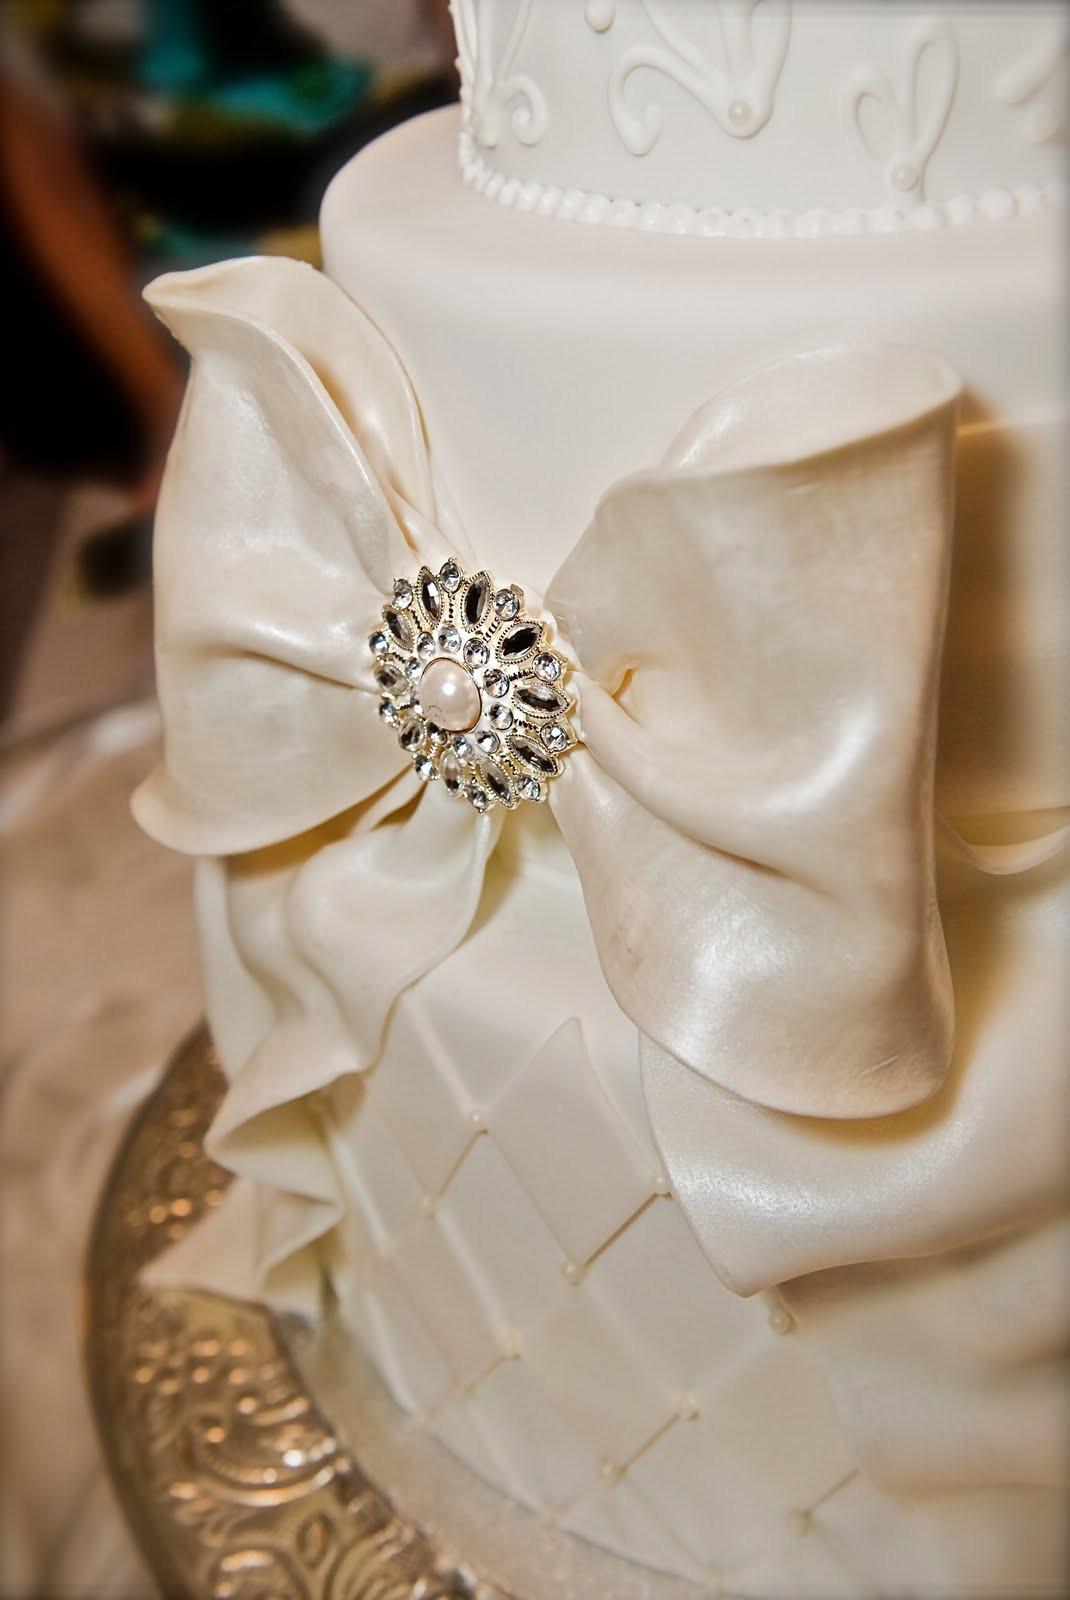 Wedding Cakes With Bows  The Good Apple Big Bow Wedding Cake